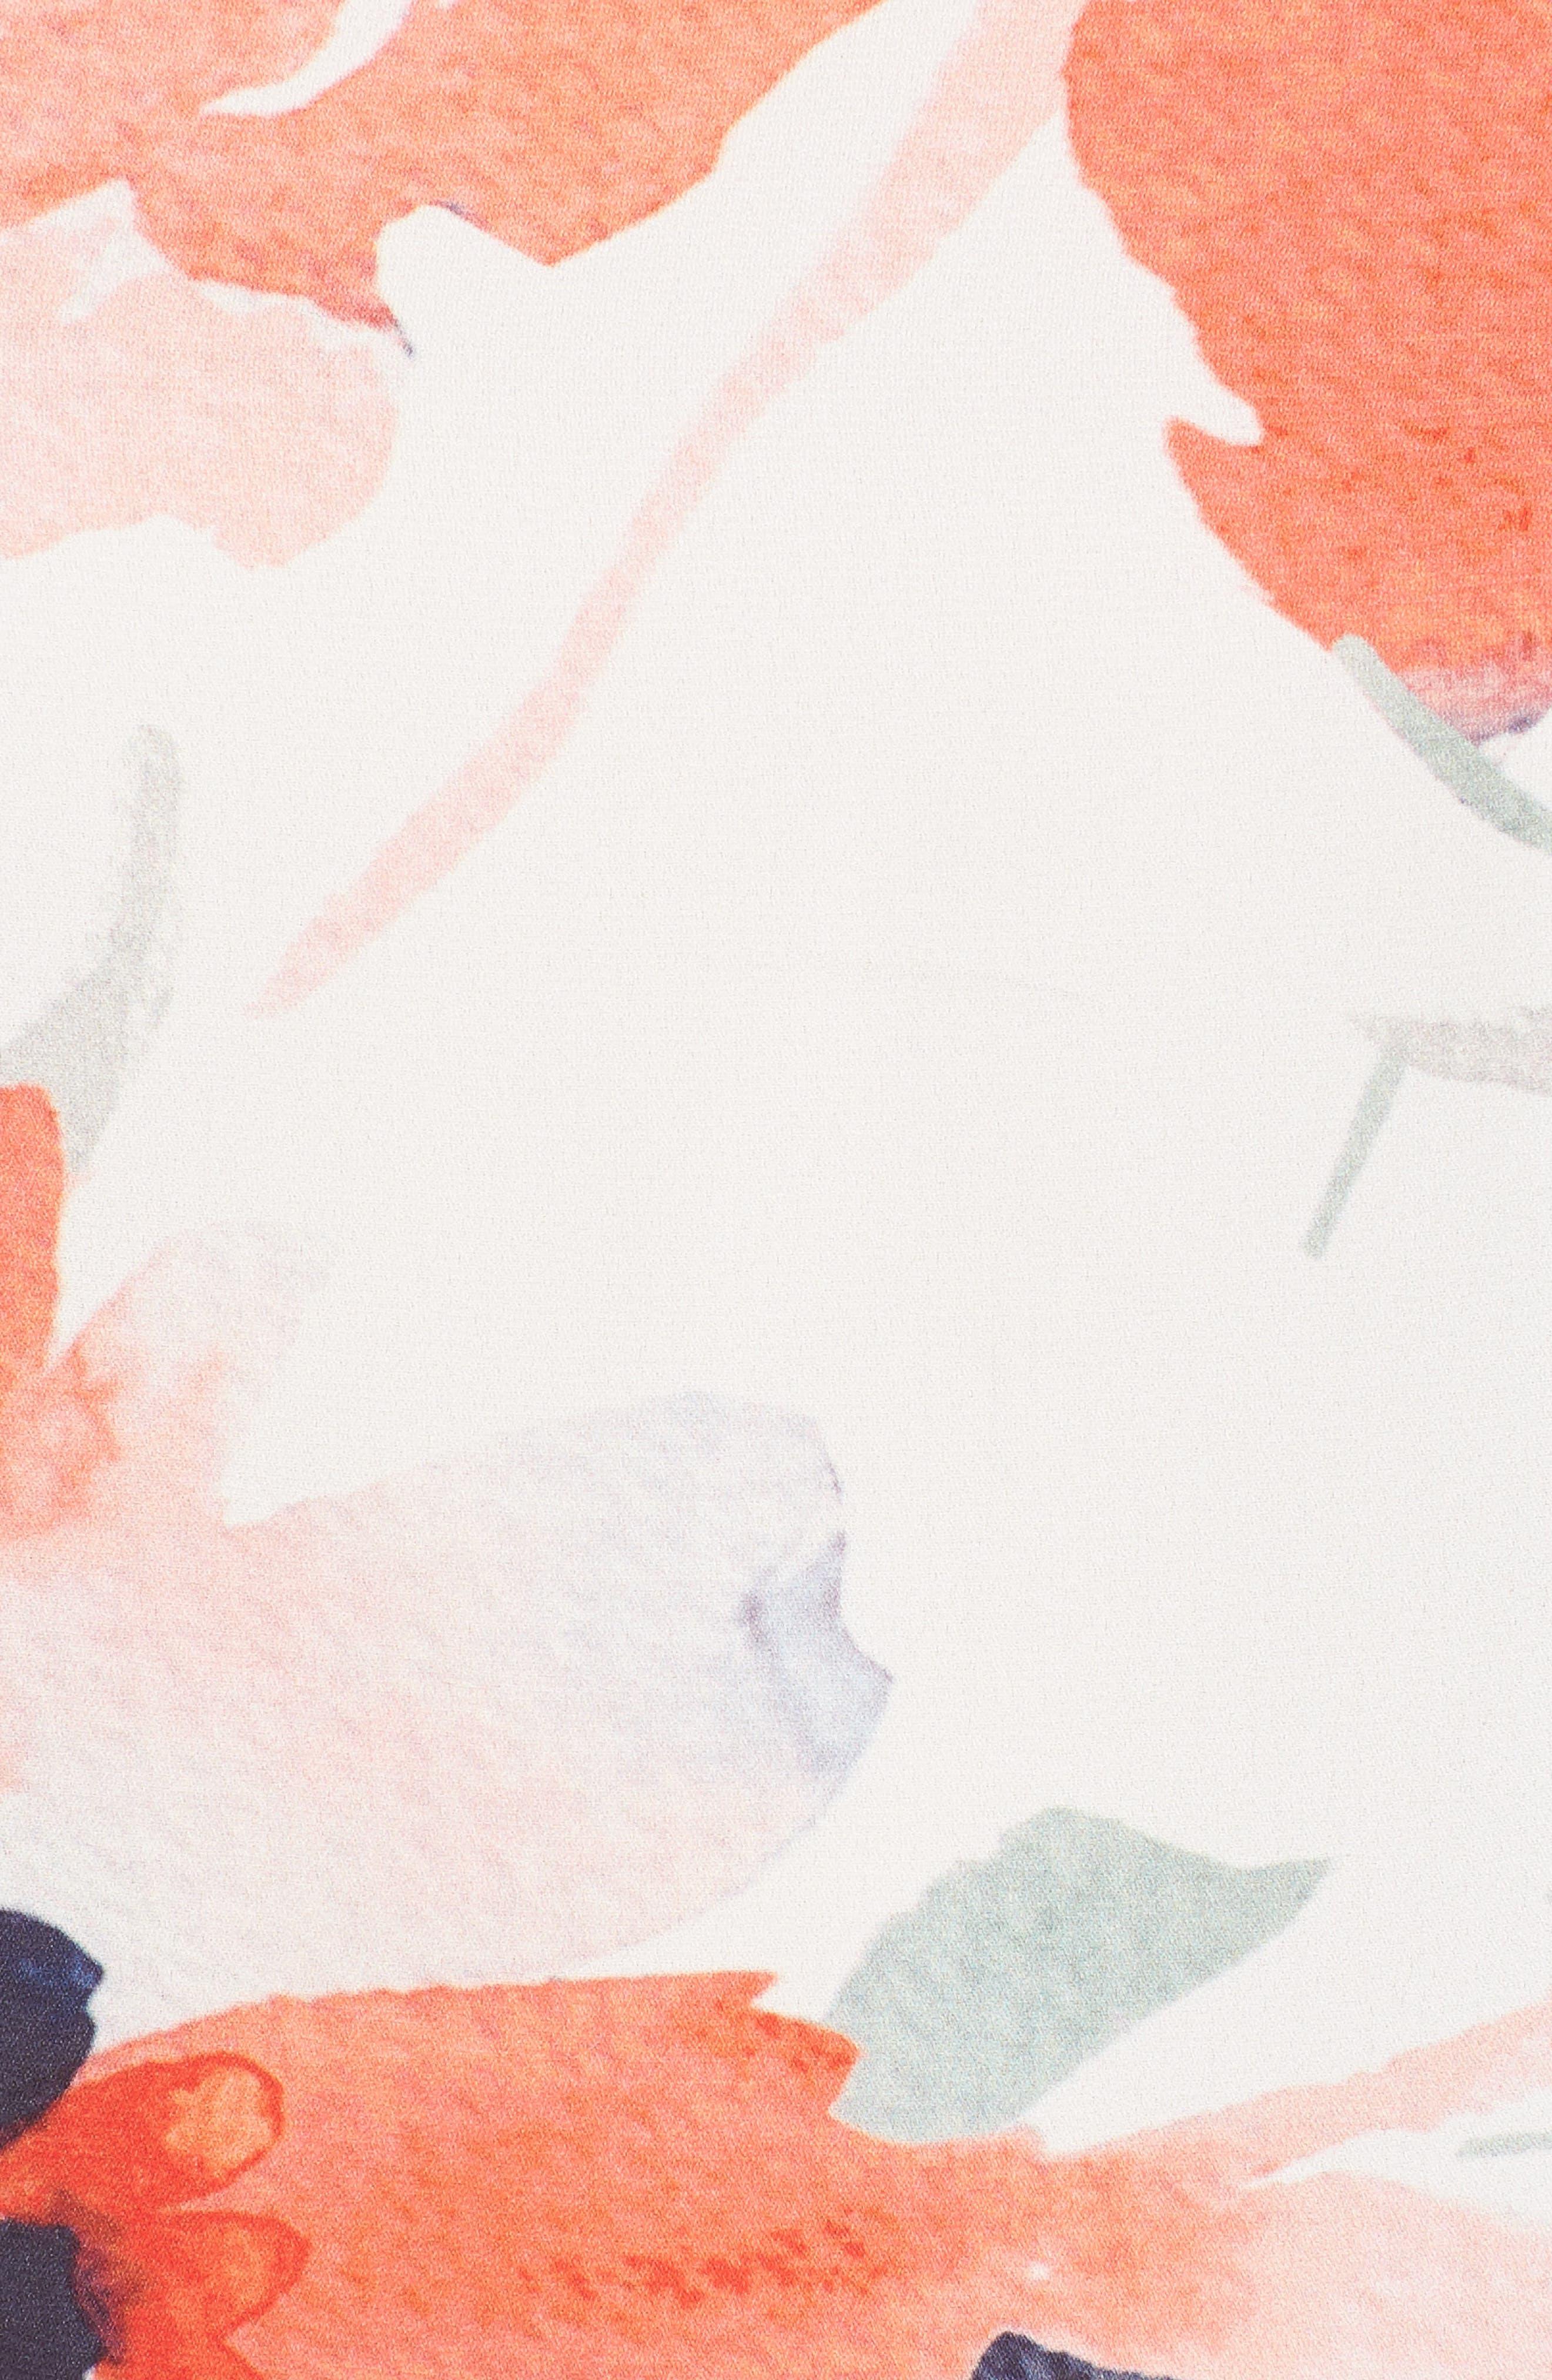 Bishop + Young Ava Cold Shoulder Top,                             Alternate thumbnail 5, color,                             601